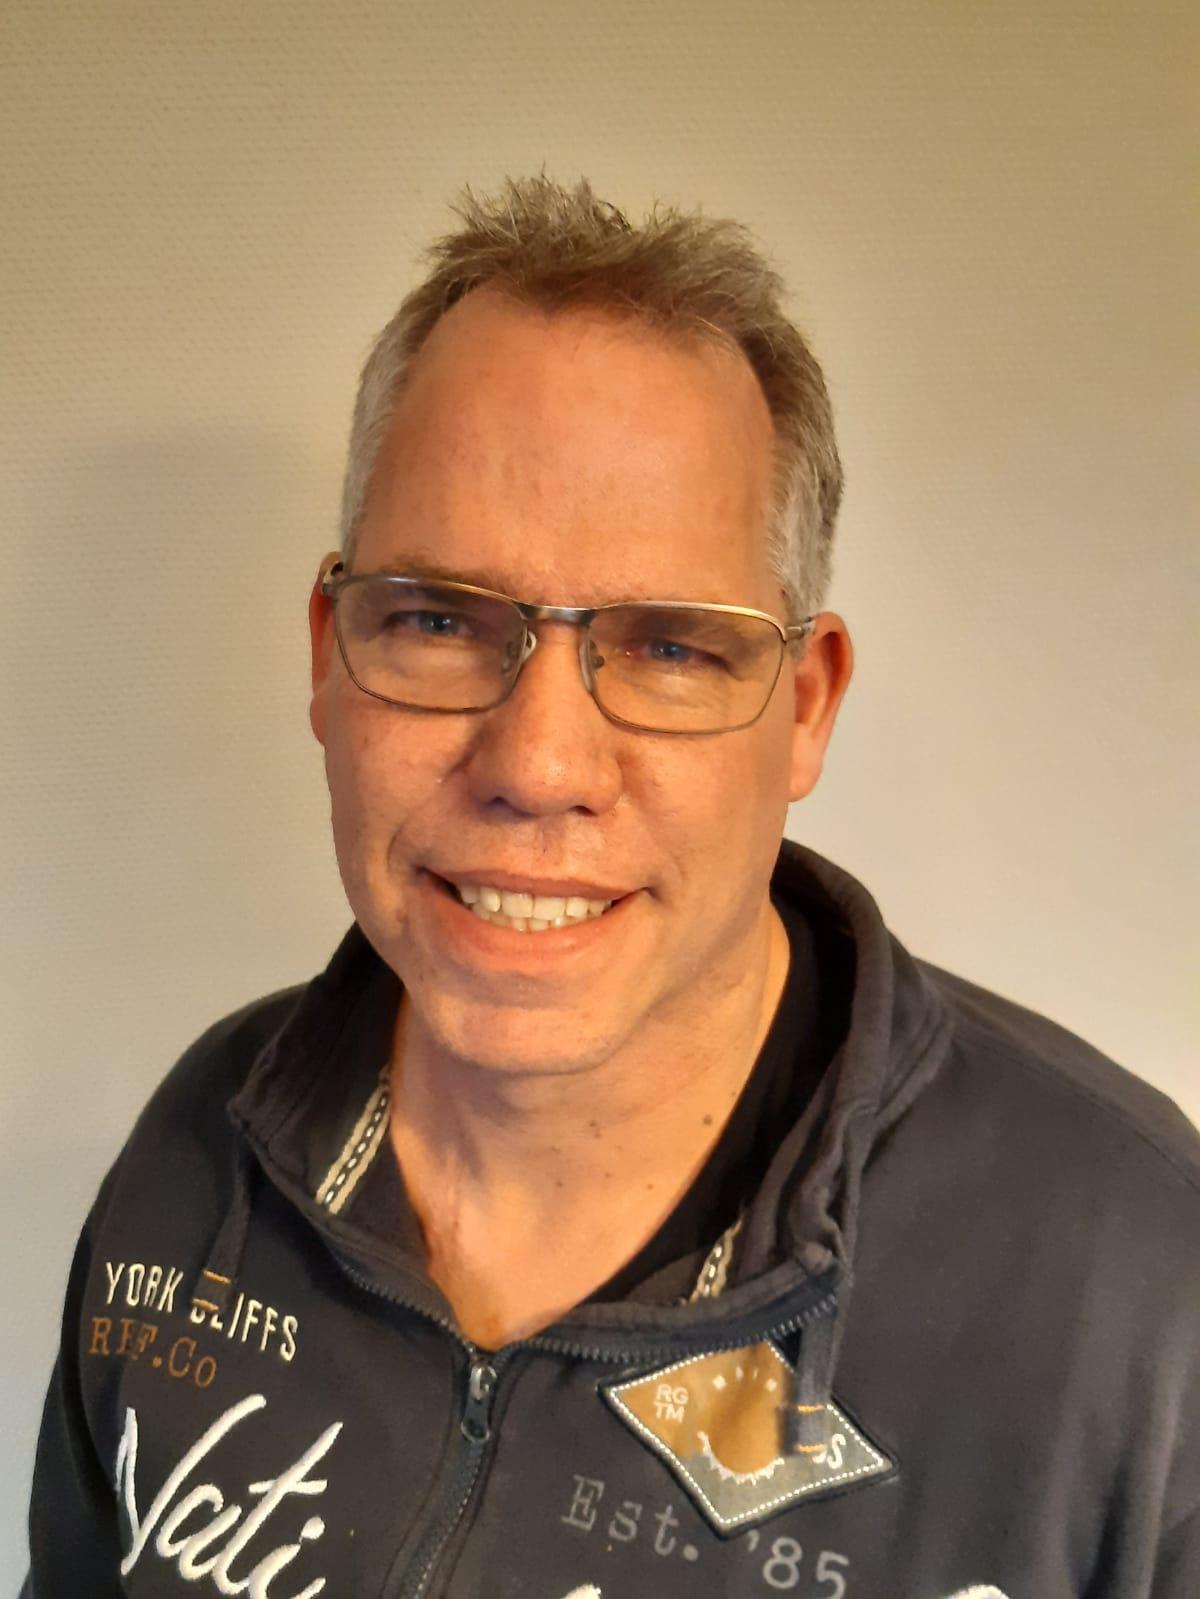 Levinius Matthijsse - Bio akkerbouwer en Vollegrondsgroente in Bant